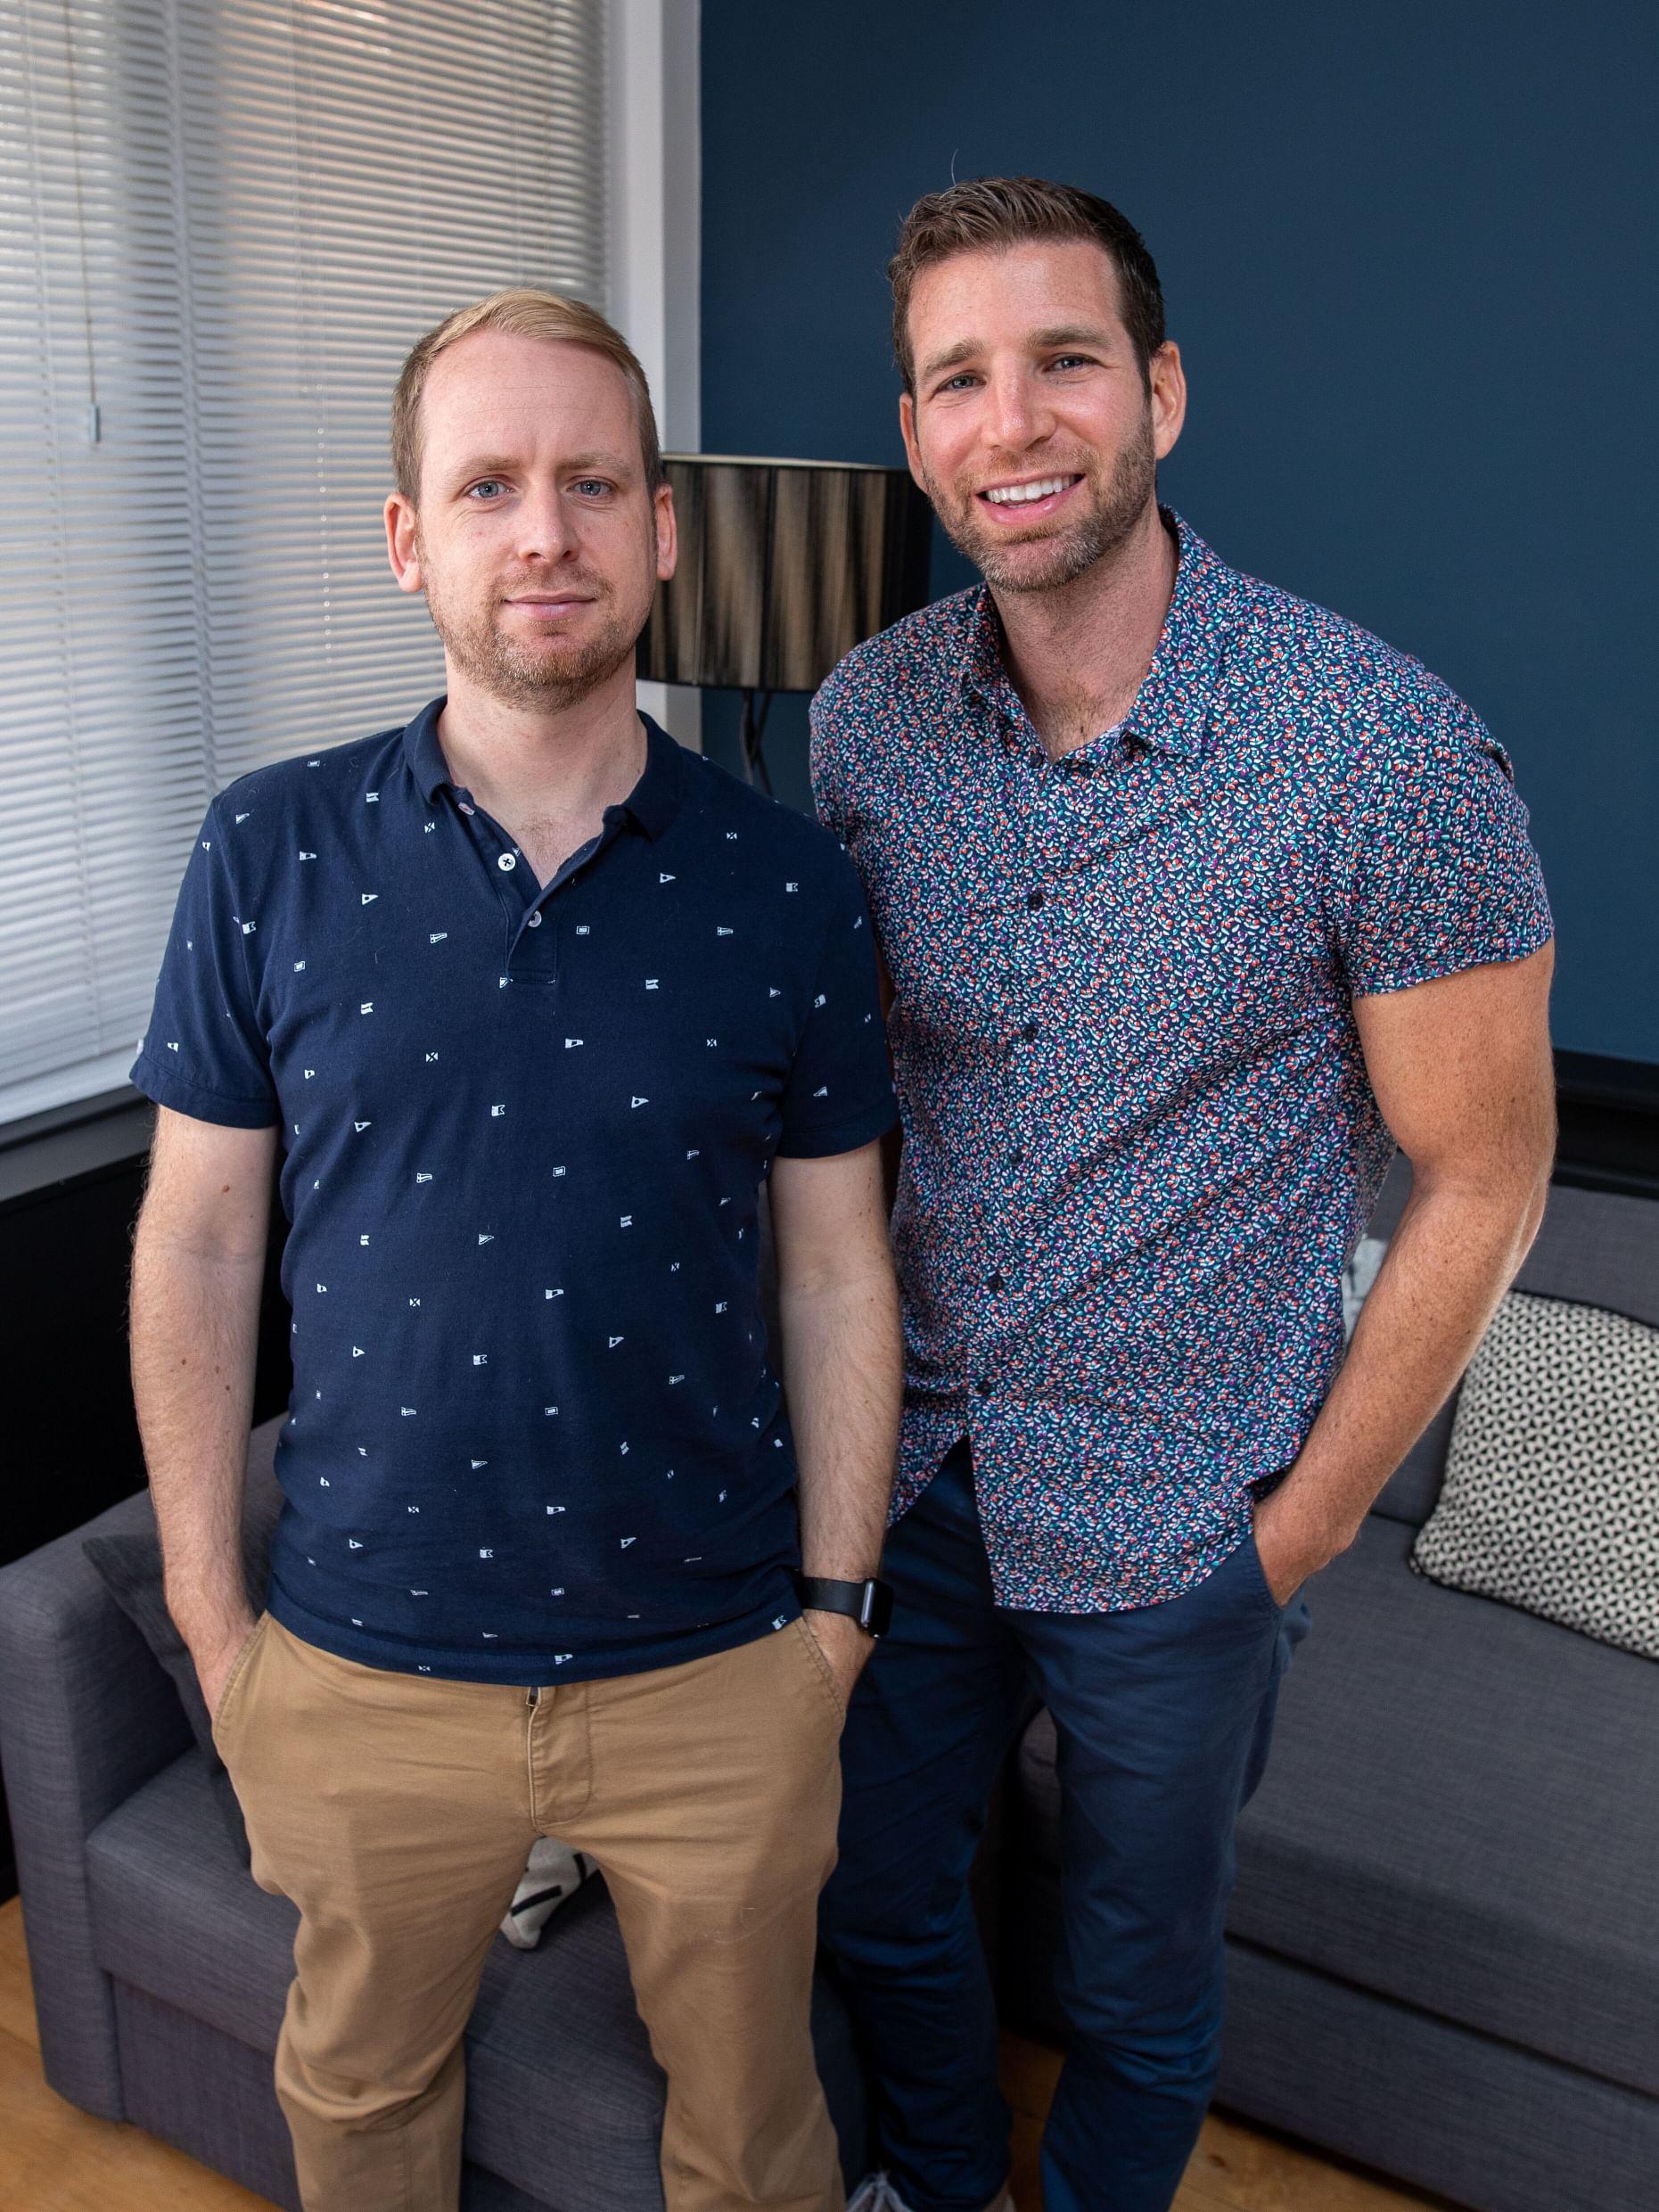 Andi Gladwin and Joshua Jay cofounders and owners of vanishing inc online magic shop